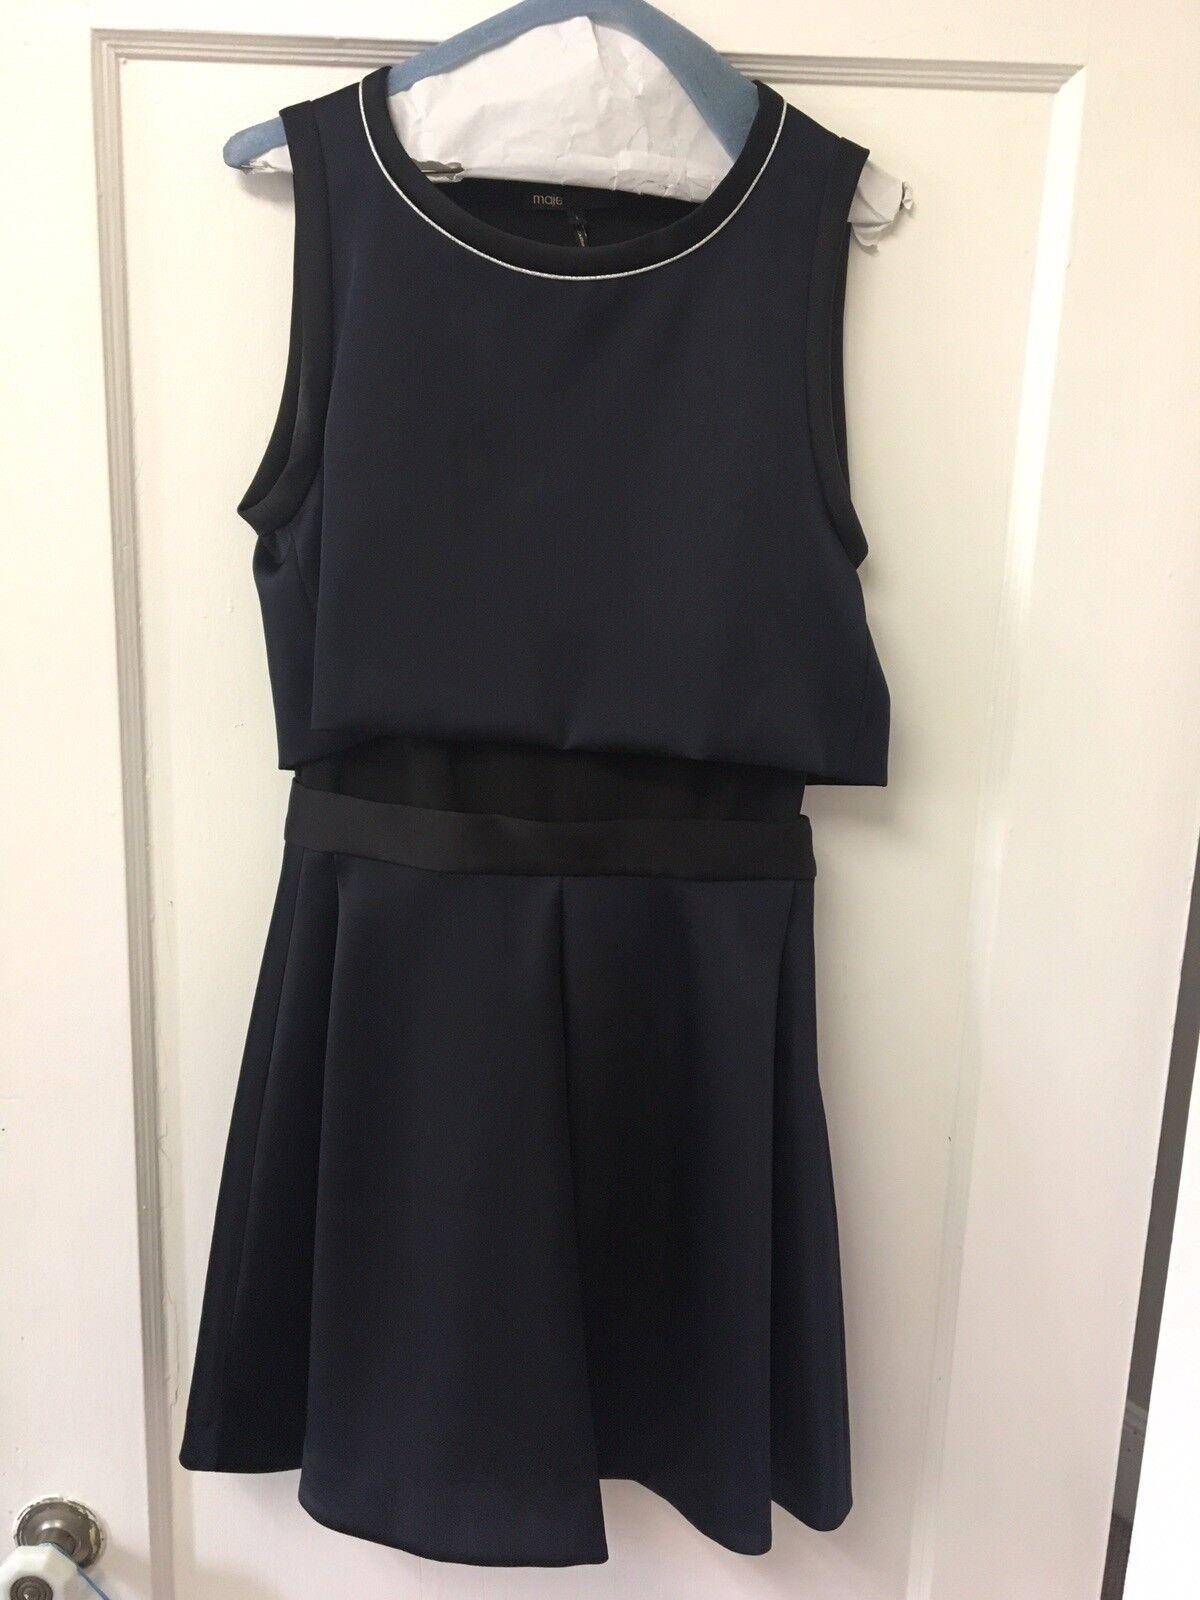 Maje Dress Size 1(0-2) Worn Once